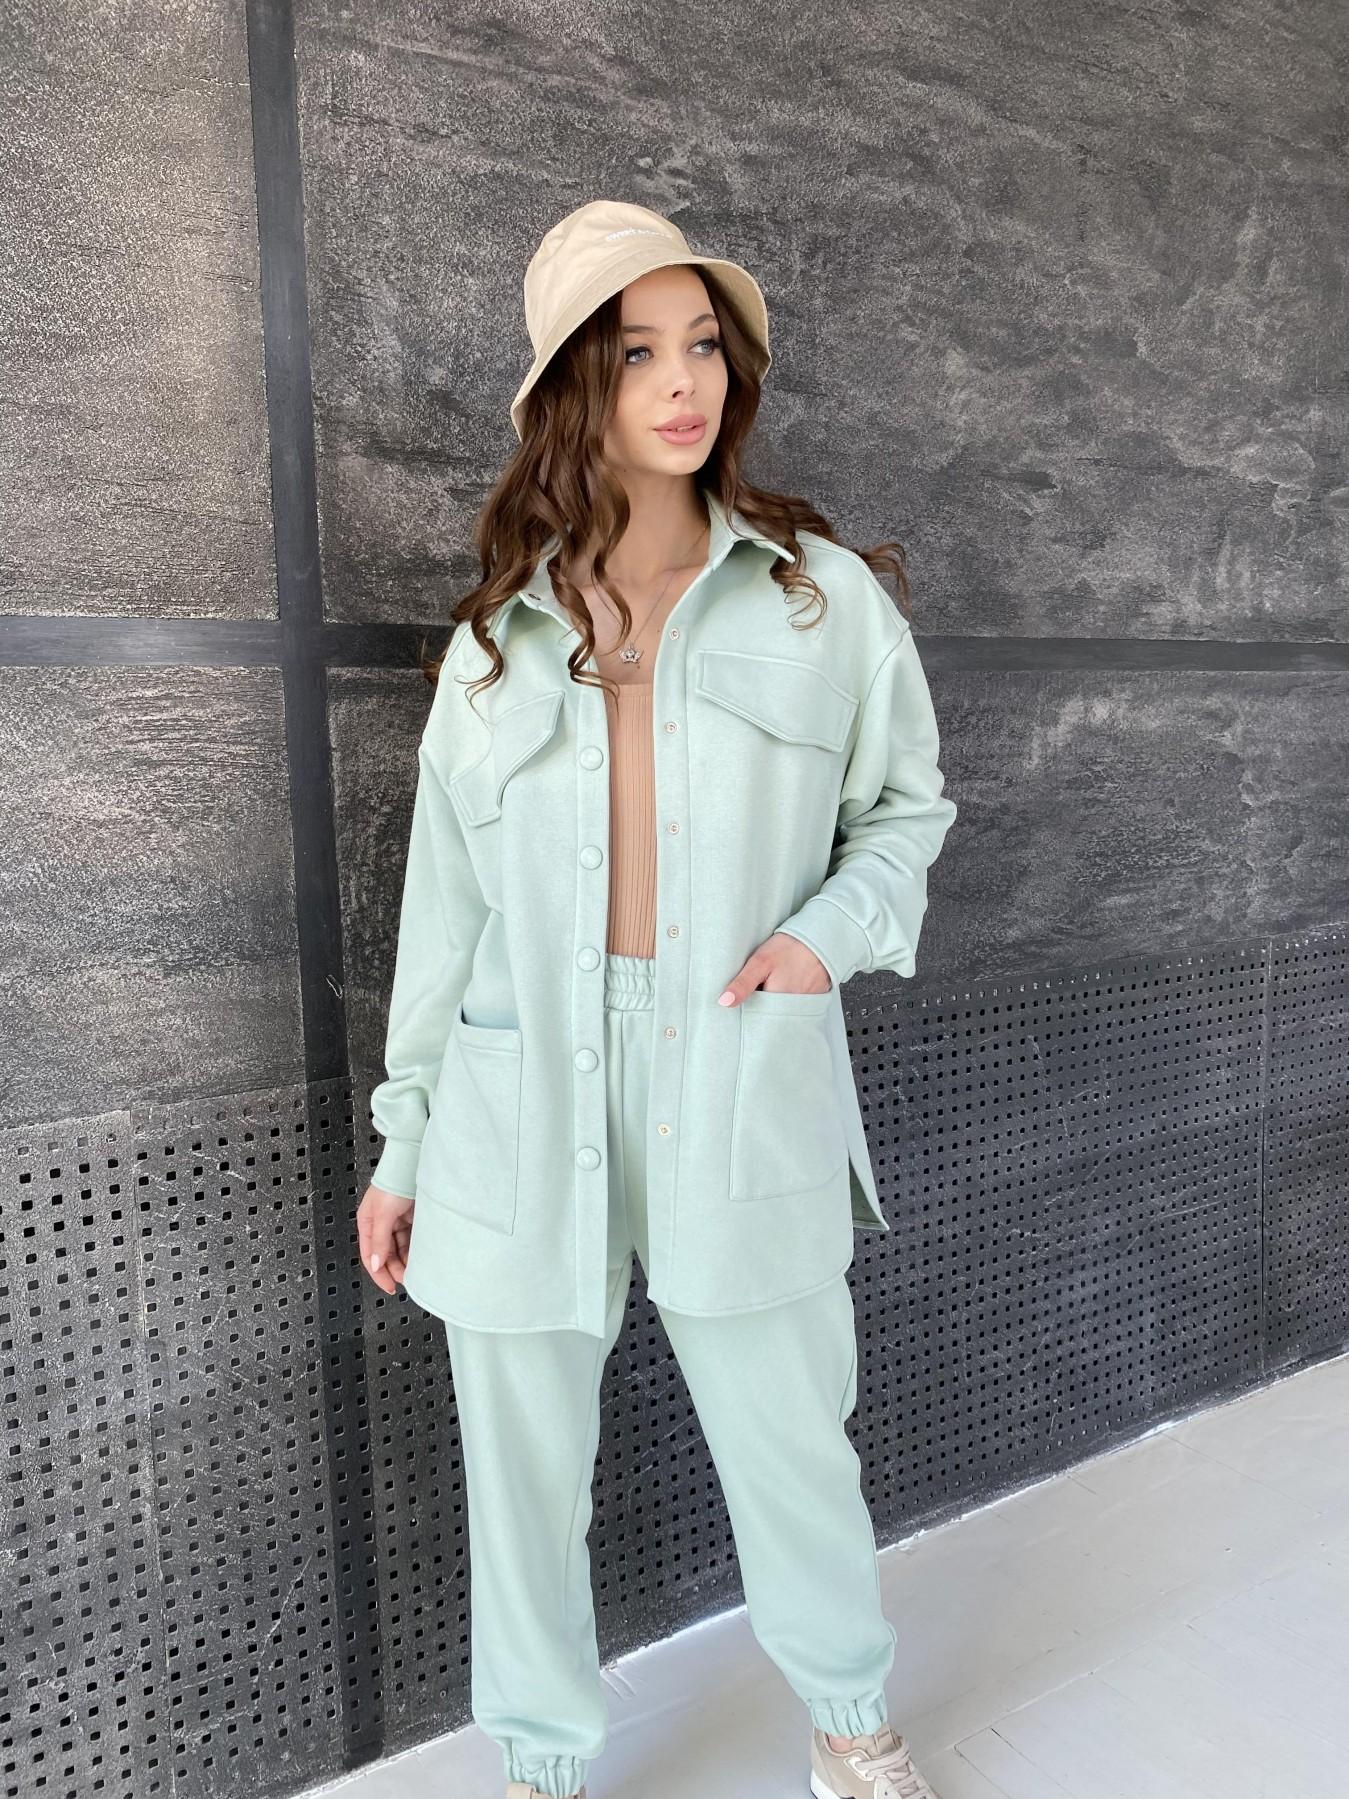 Респект костюм из трикотажа  3х нитка 11055 АРТ. 47576 Цвет: Олива Светлая - фото 3, интернет магазин tm-modus.ru